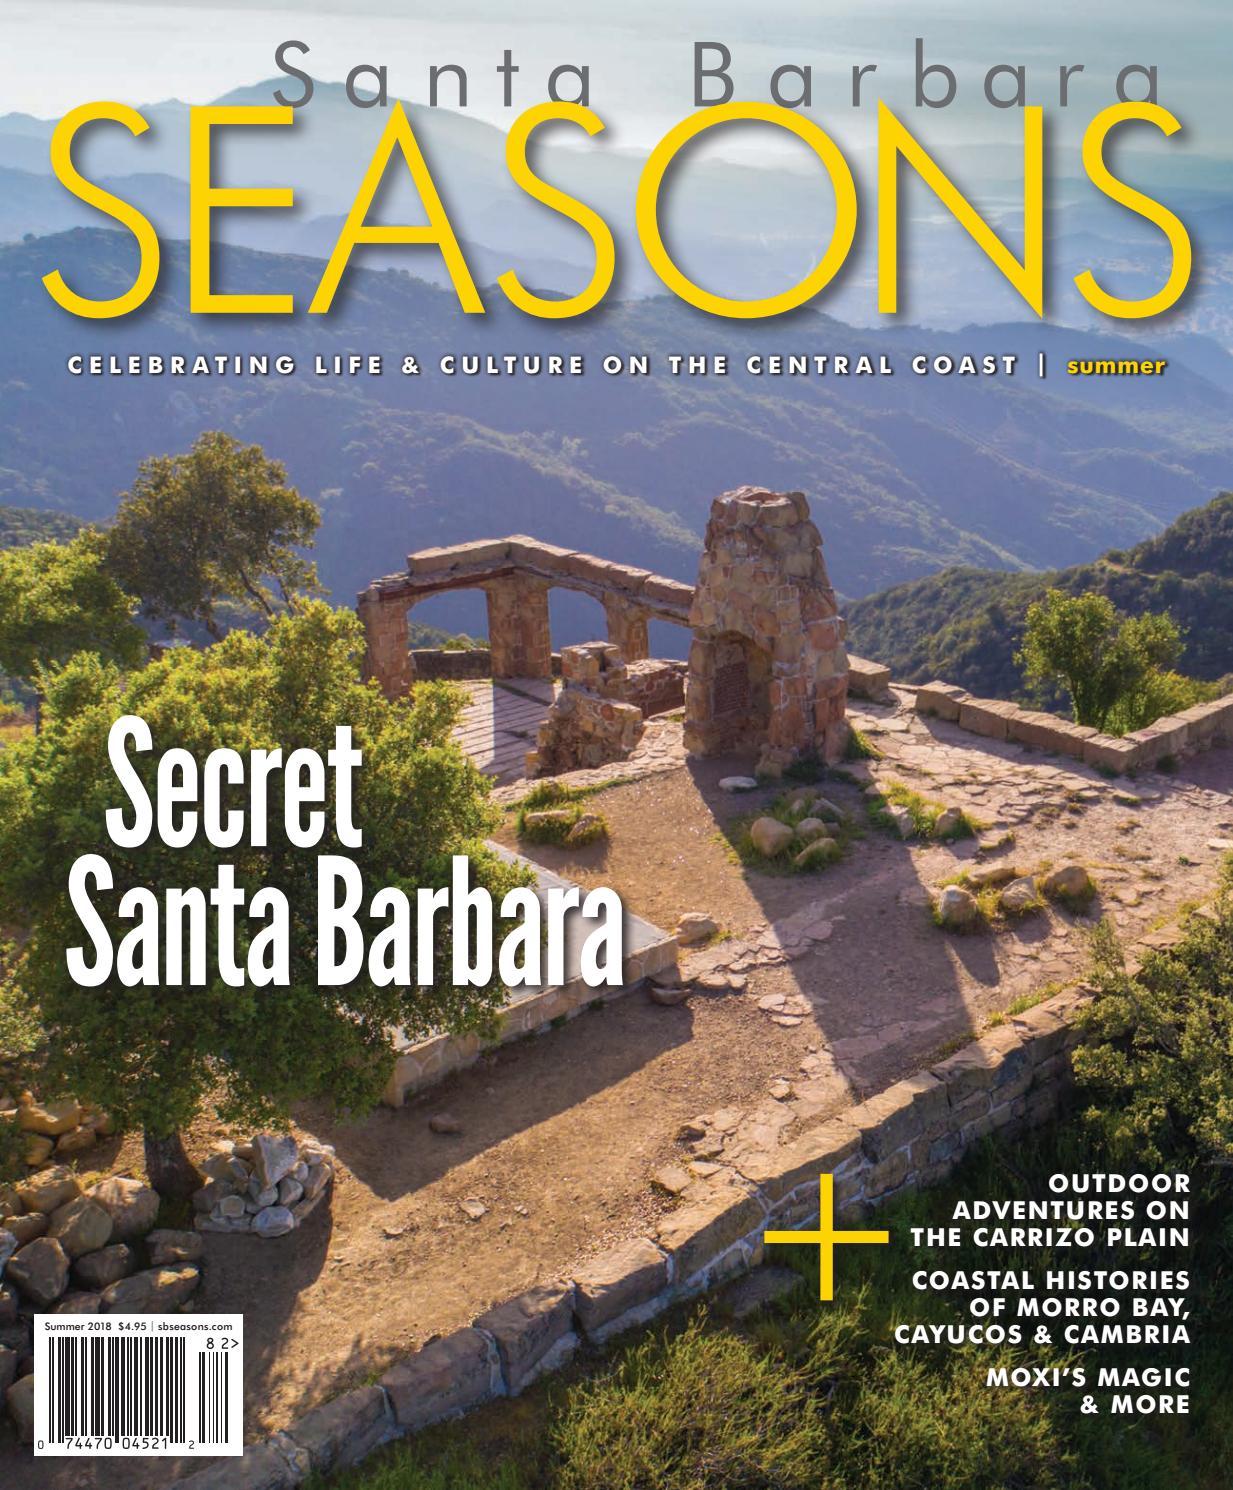 ac07105861c Santa Barbara Seasons Magazine Summer 2018 by sbseasons - issuu